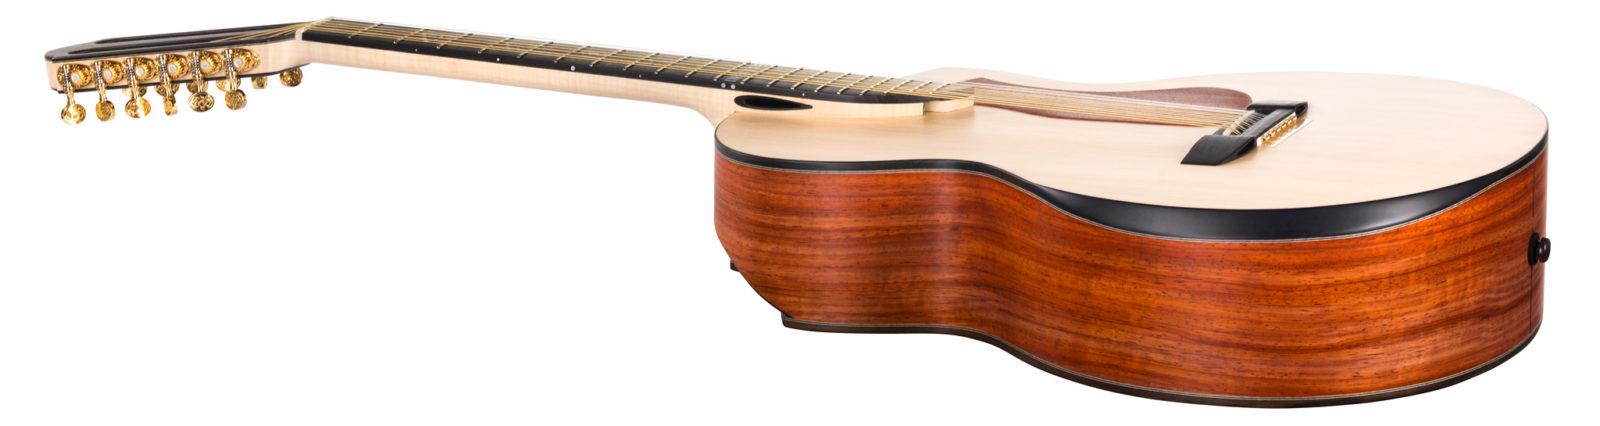 Acoustic Guitar with 2 diagonal soundports